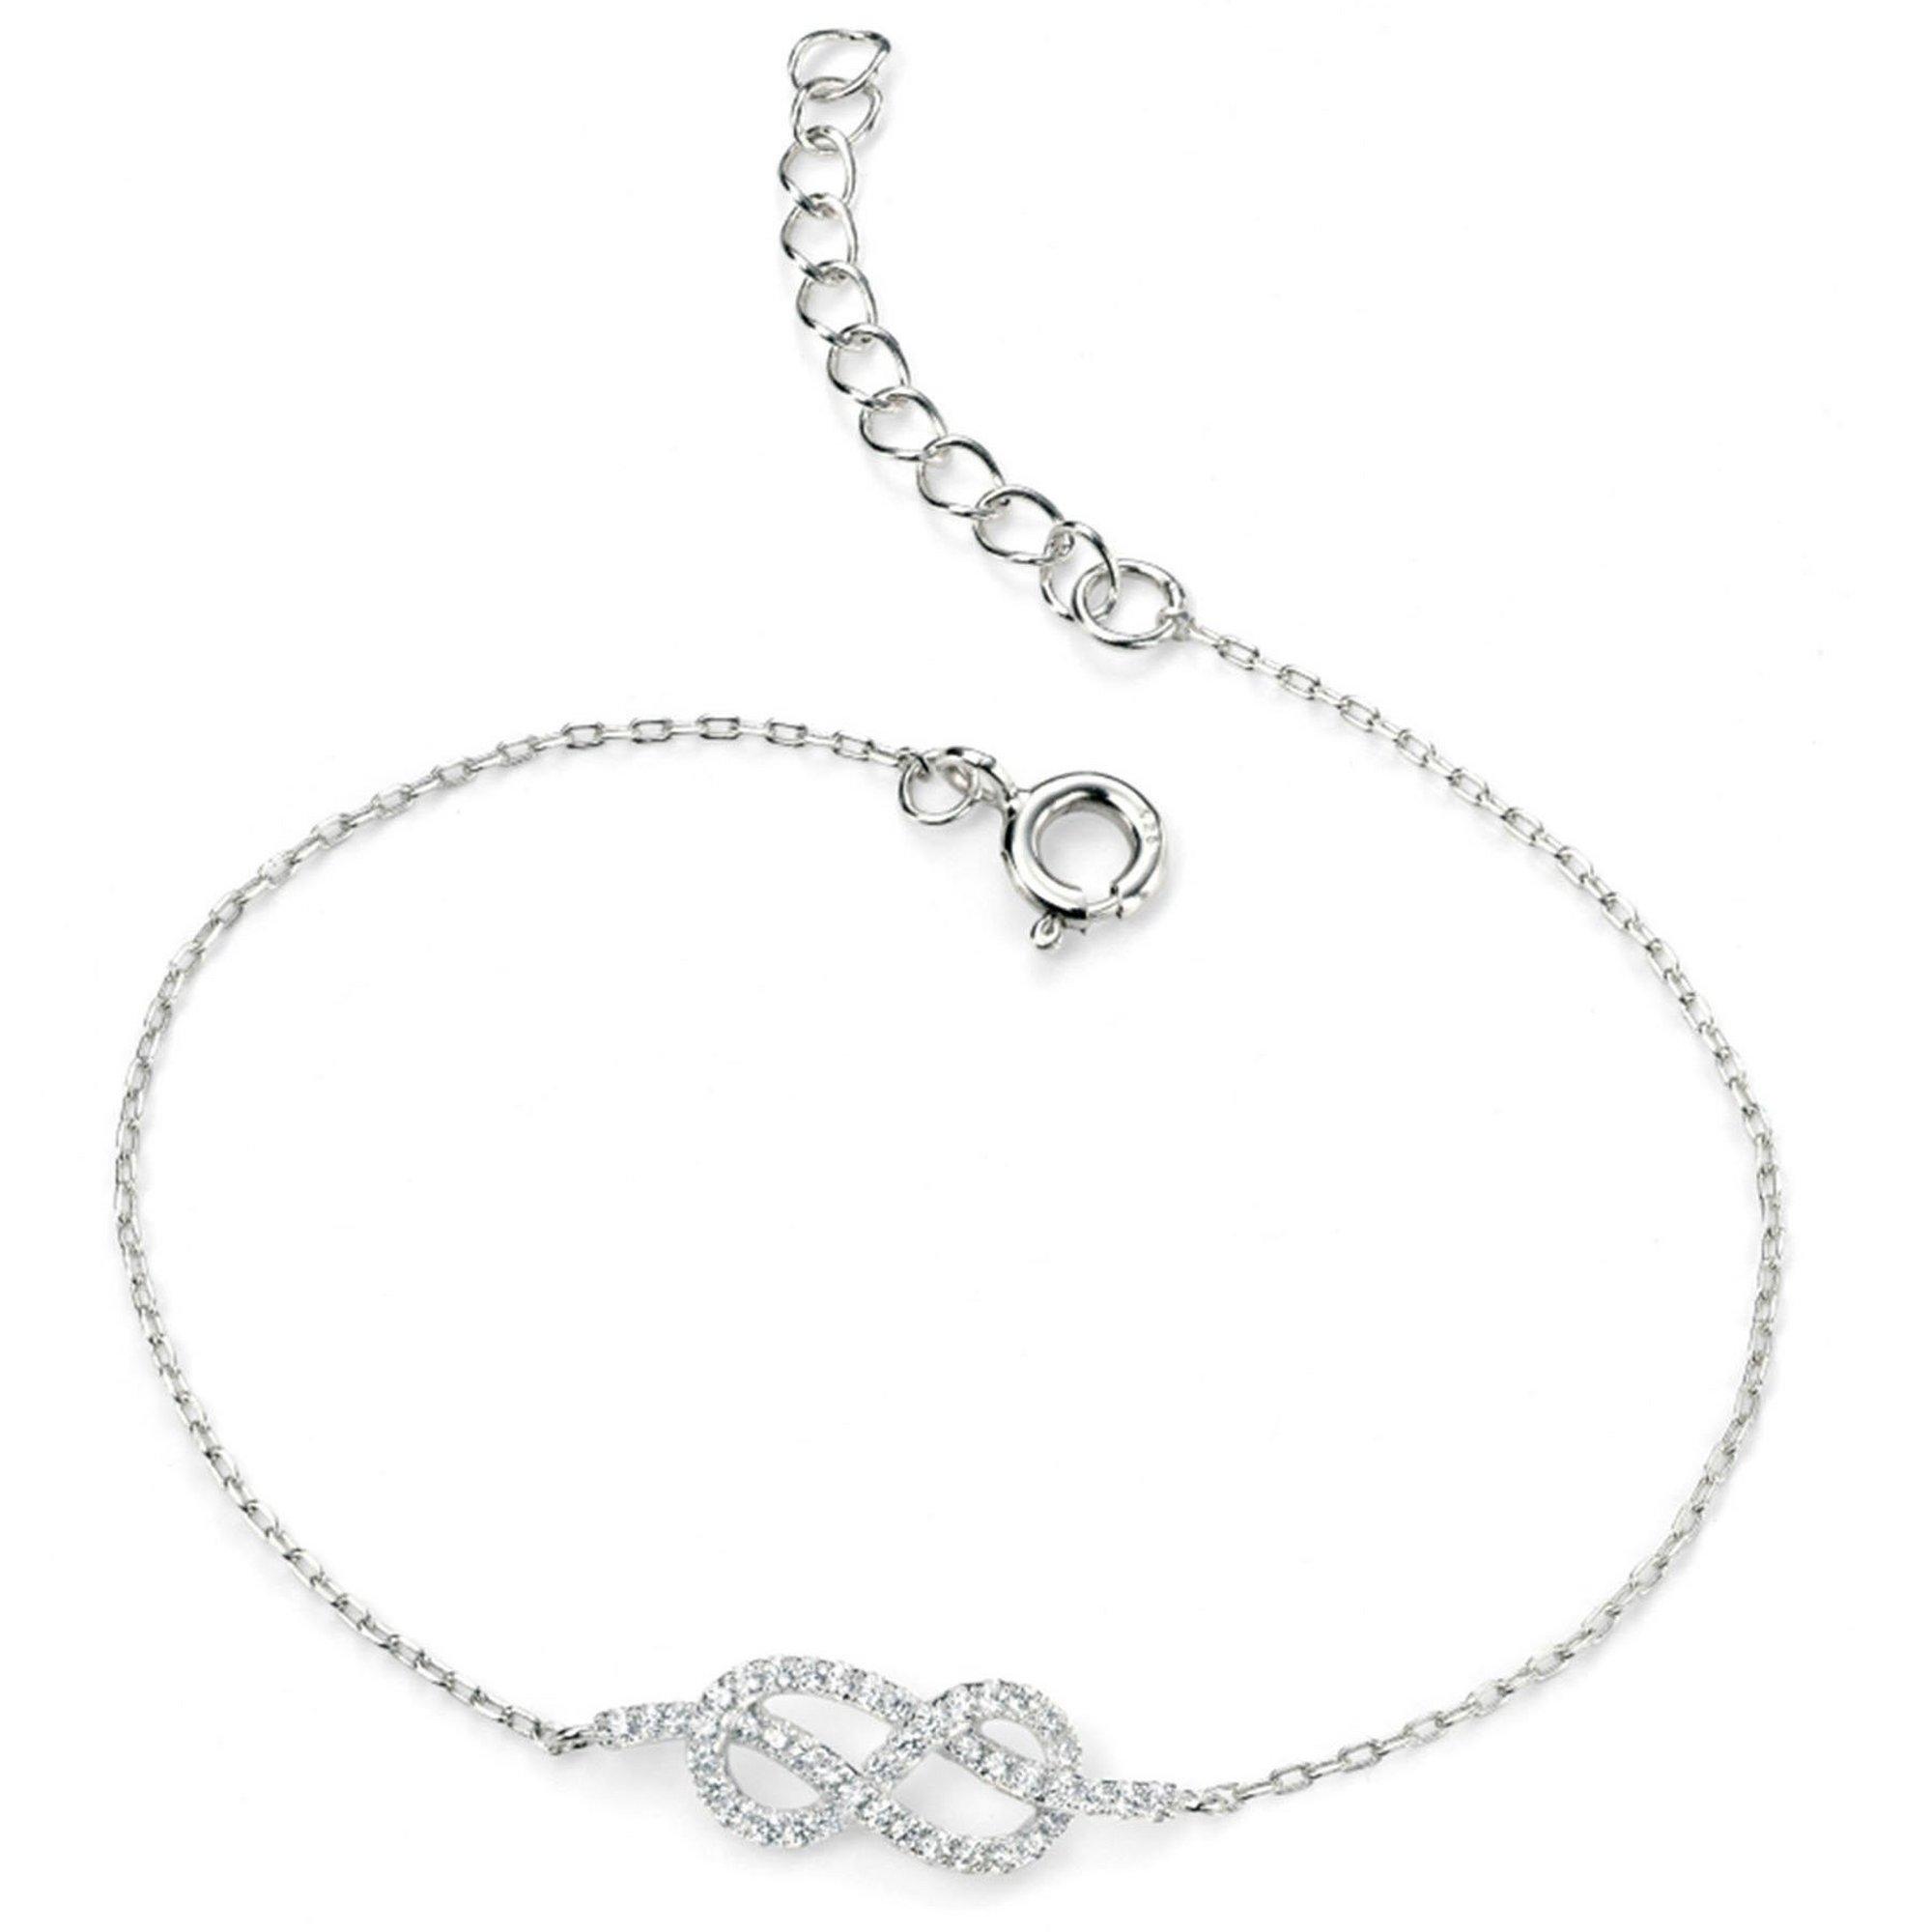 Image of Clear CZ Infinity Bracelet 17+3Cm